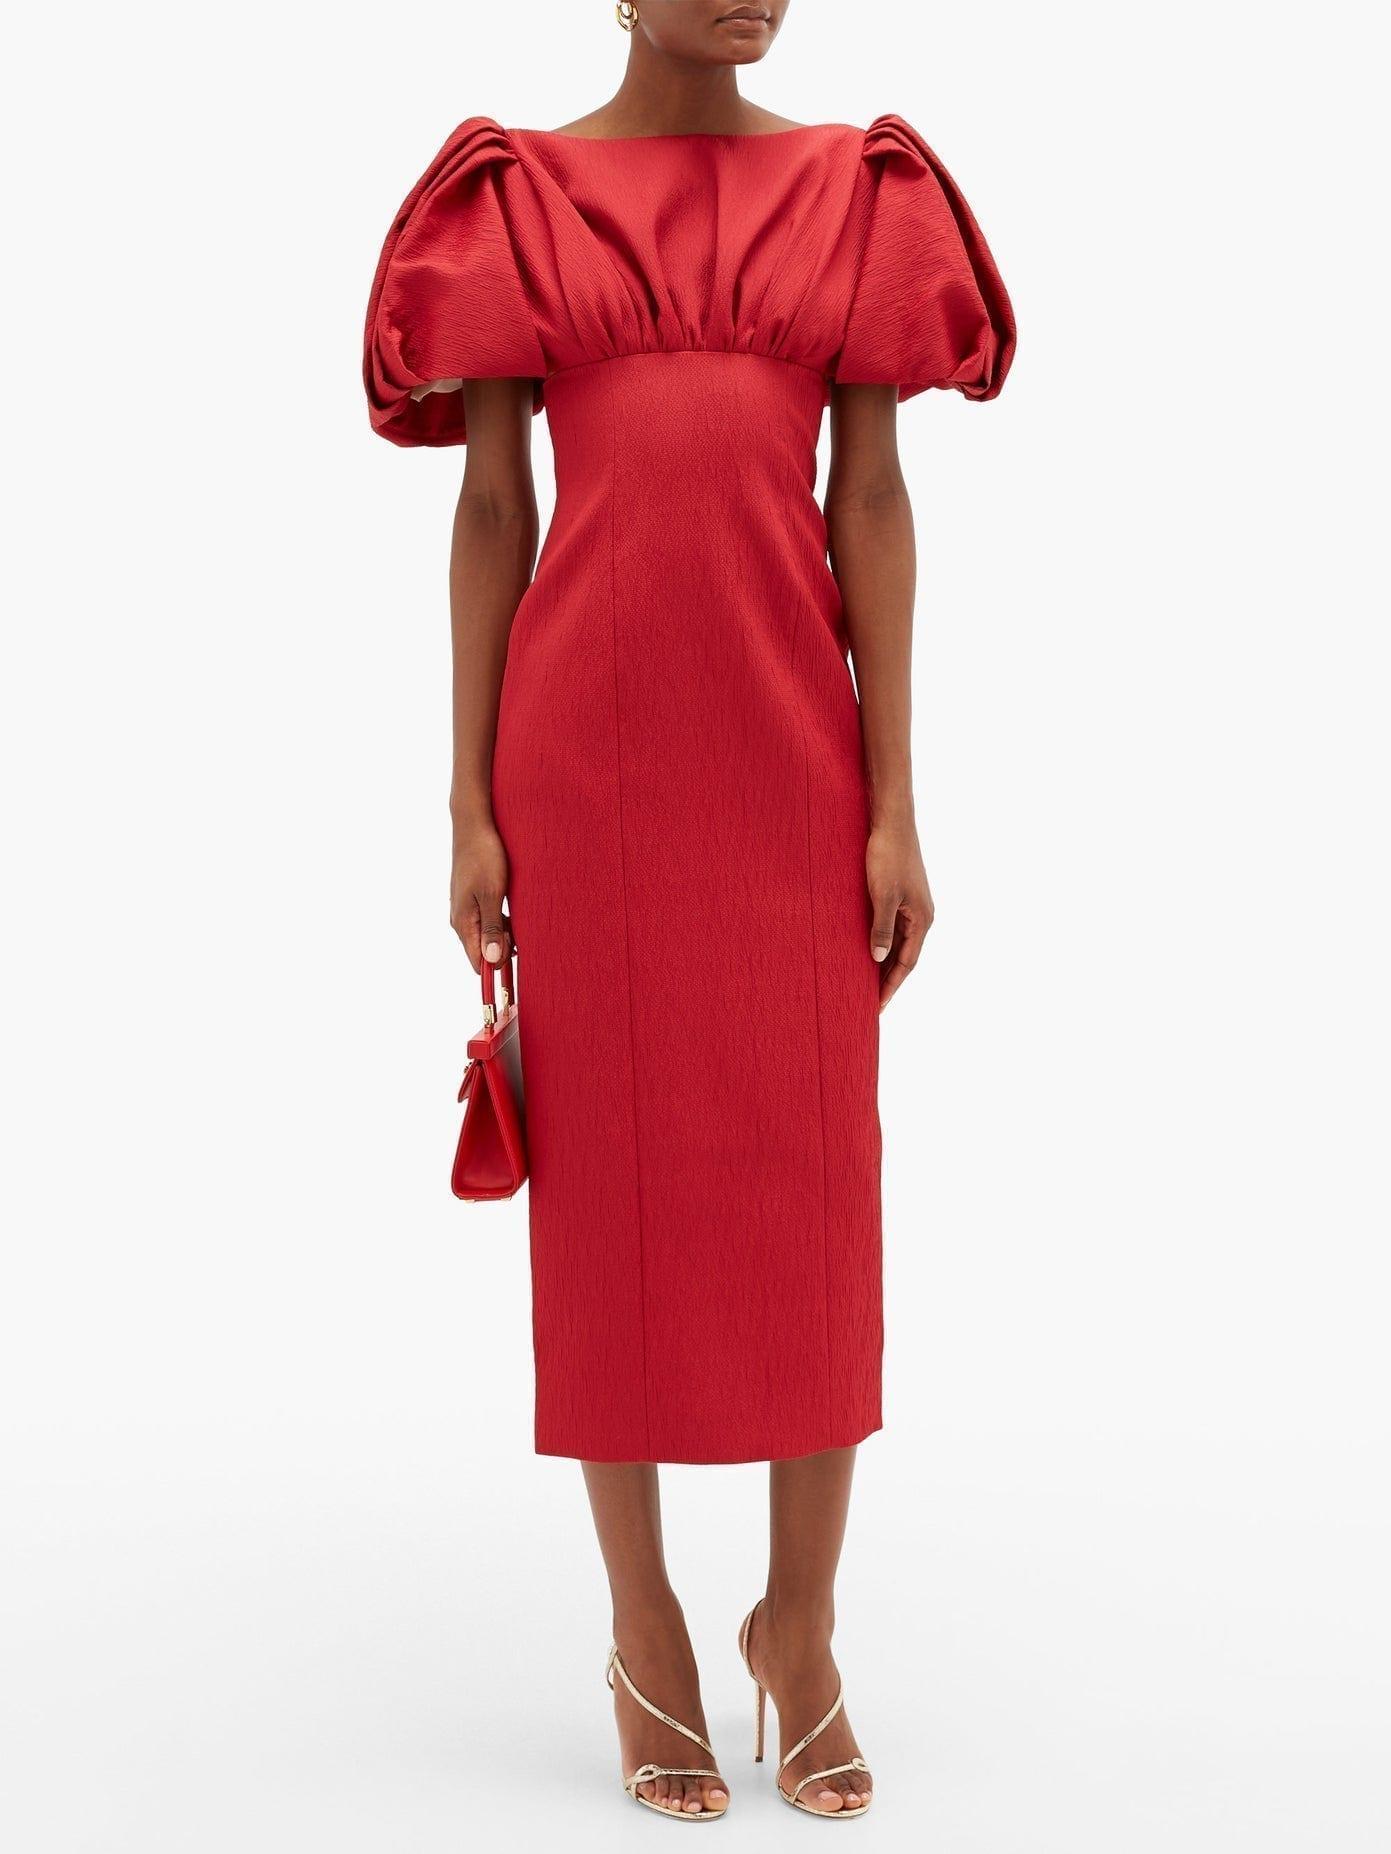 EMILIA WICKSTEAD Petunia Puffed-sleeve Textured-cloqué Dress